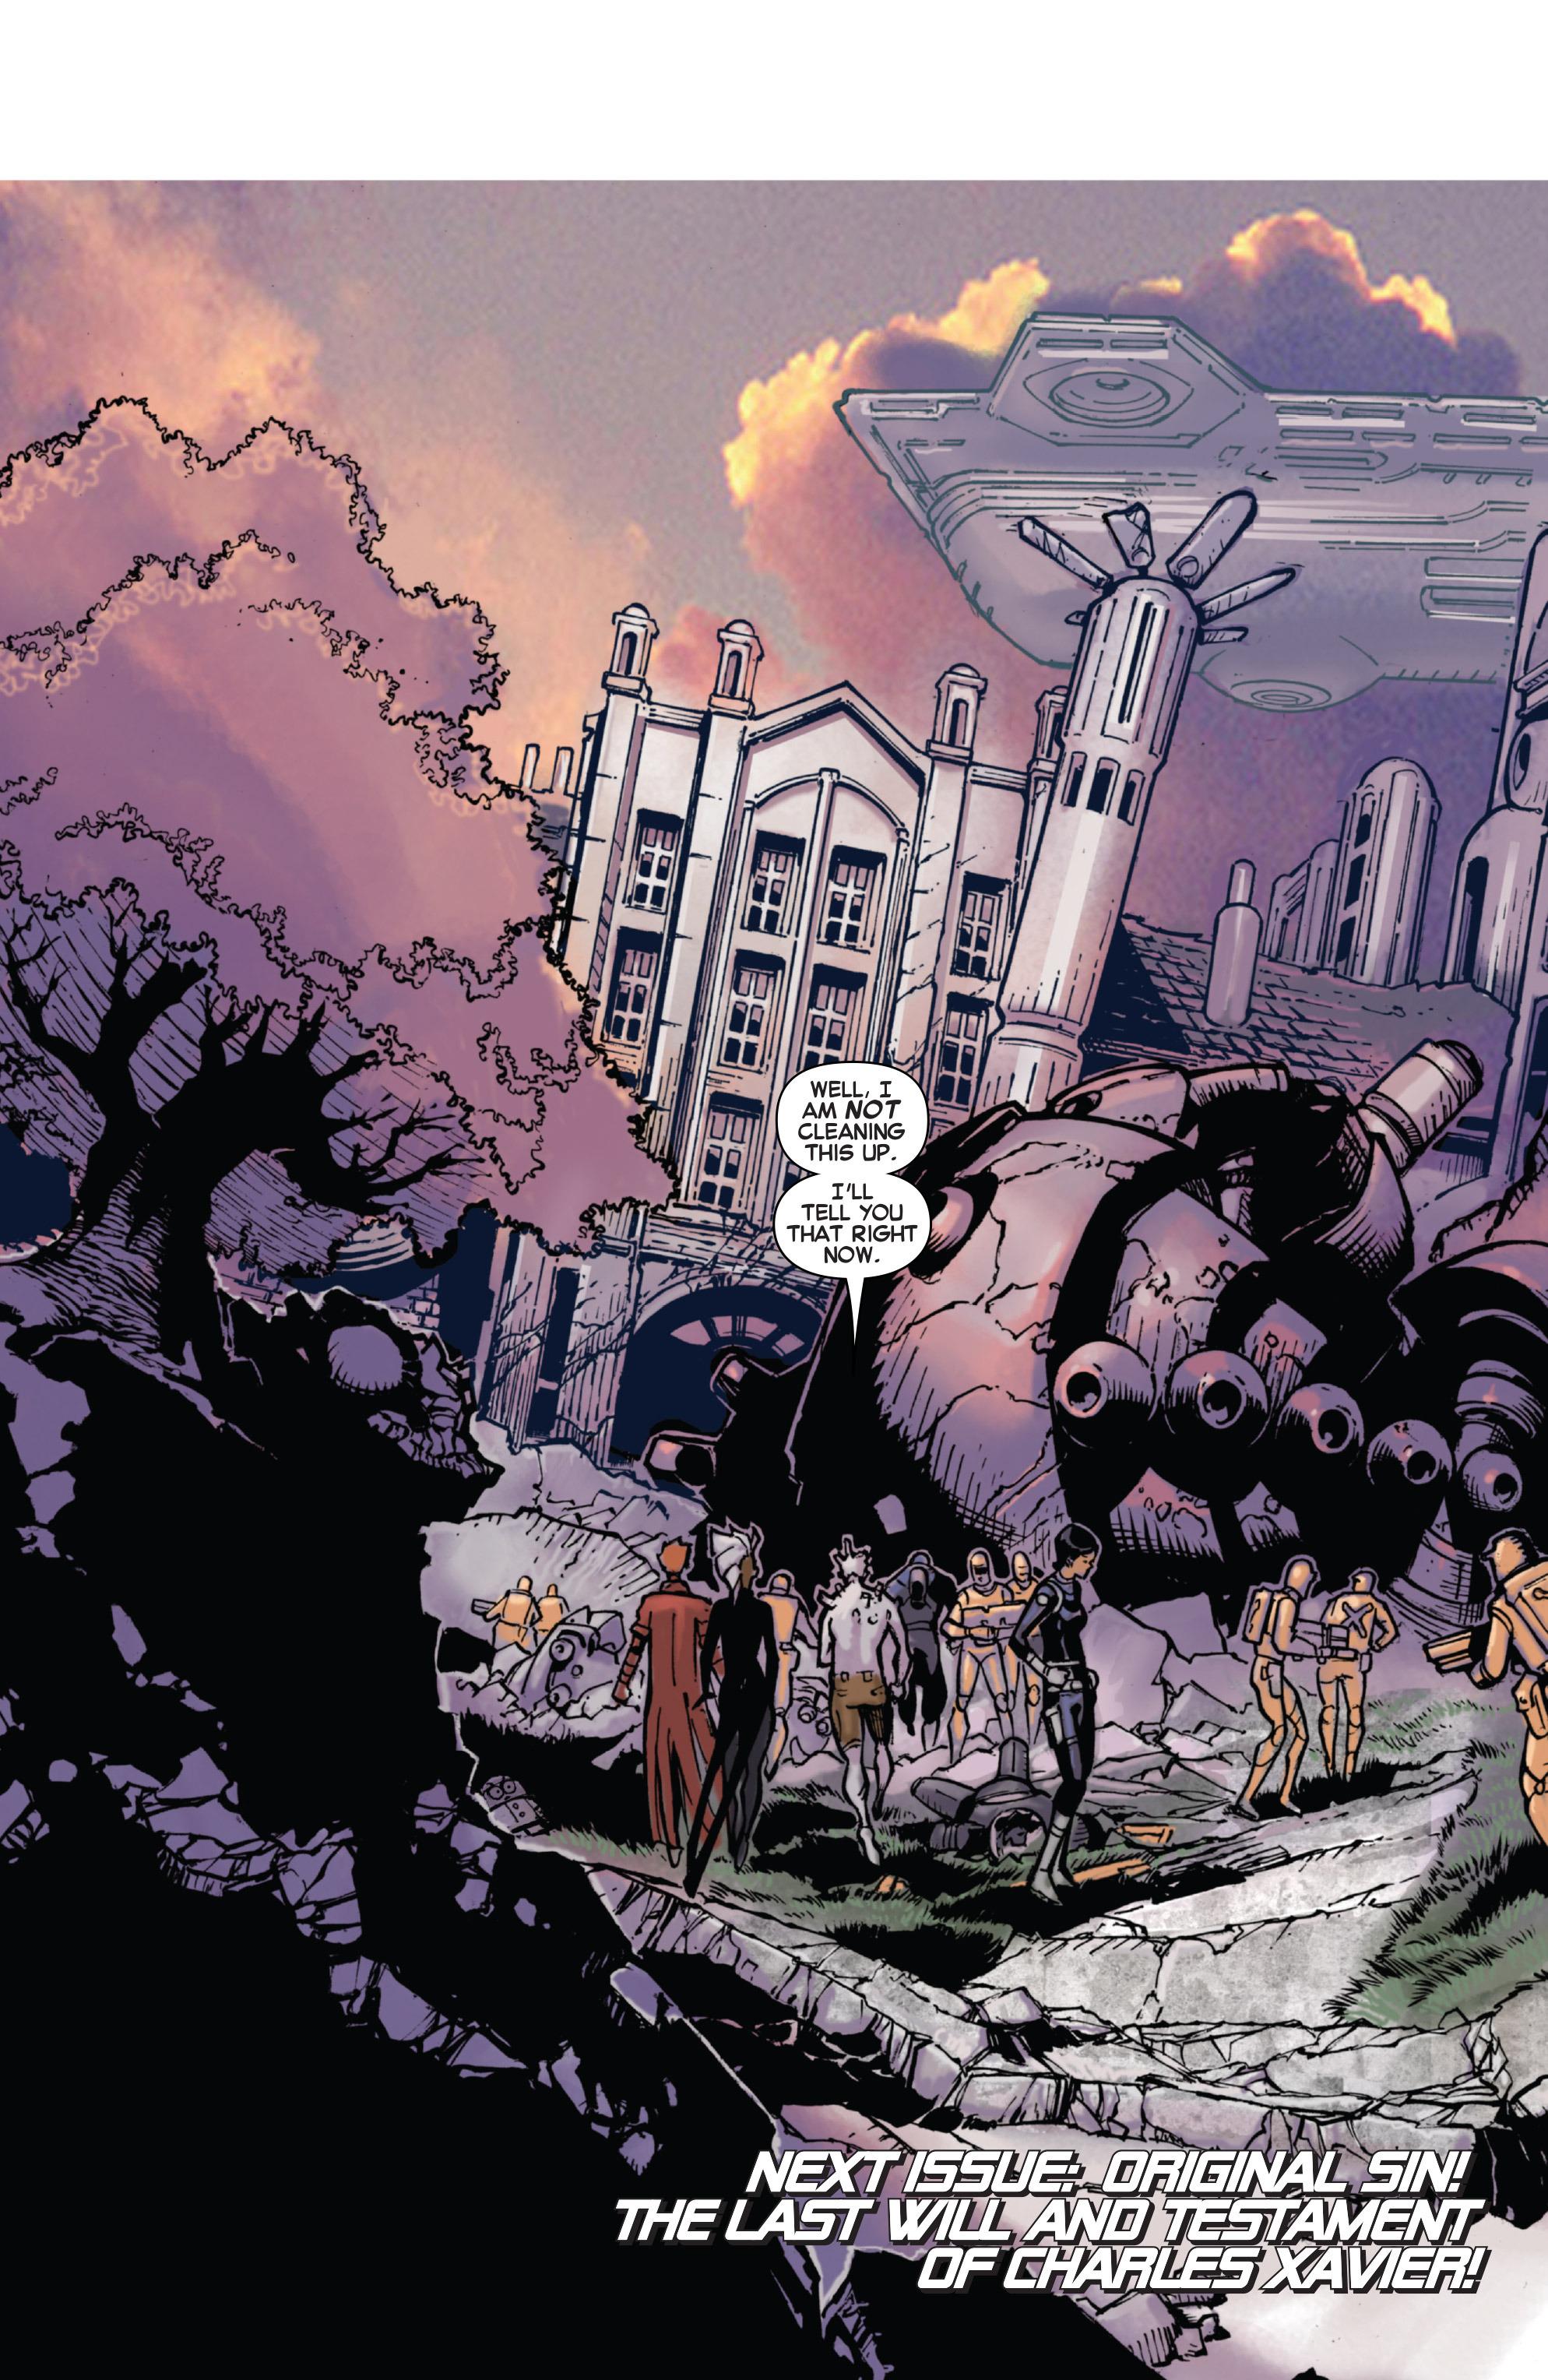 Read online Uncanny X-Men (2013) comic -  Issue # _TPB 4 - vs. S.H.I.E.L.D - 79